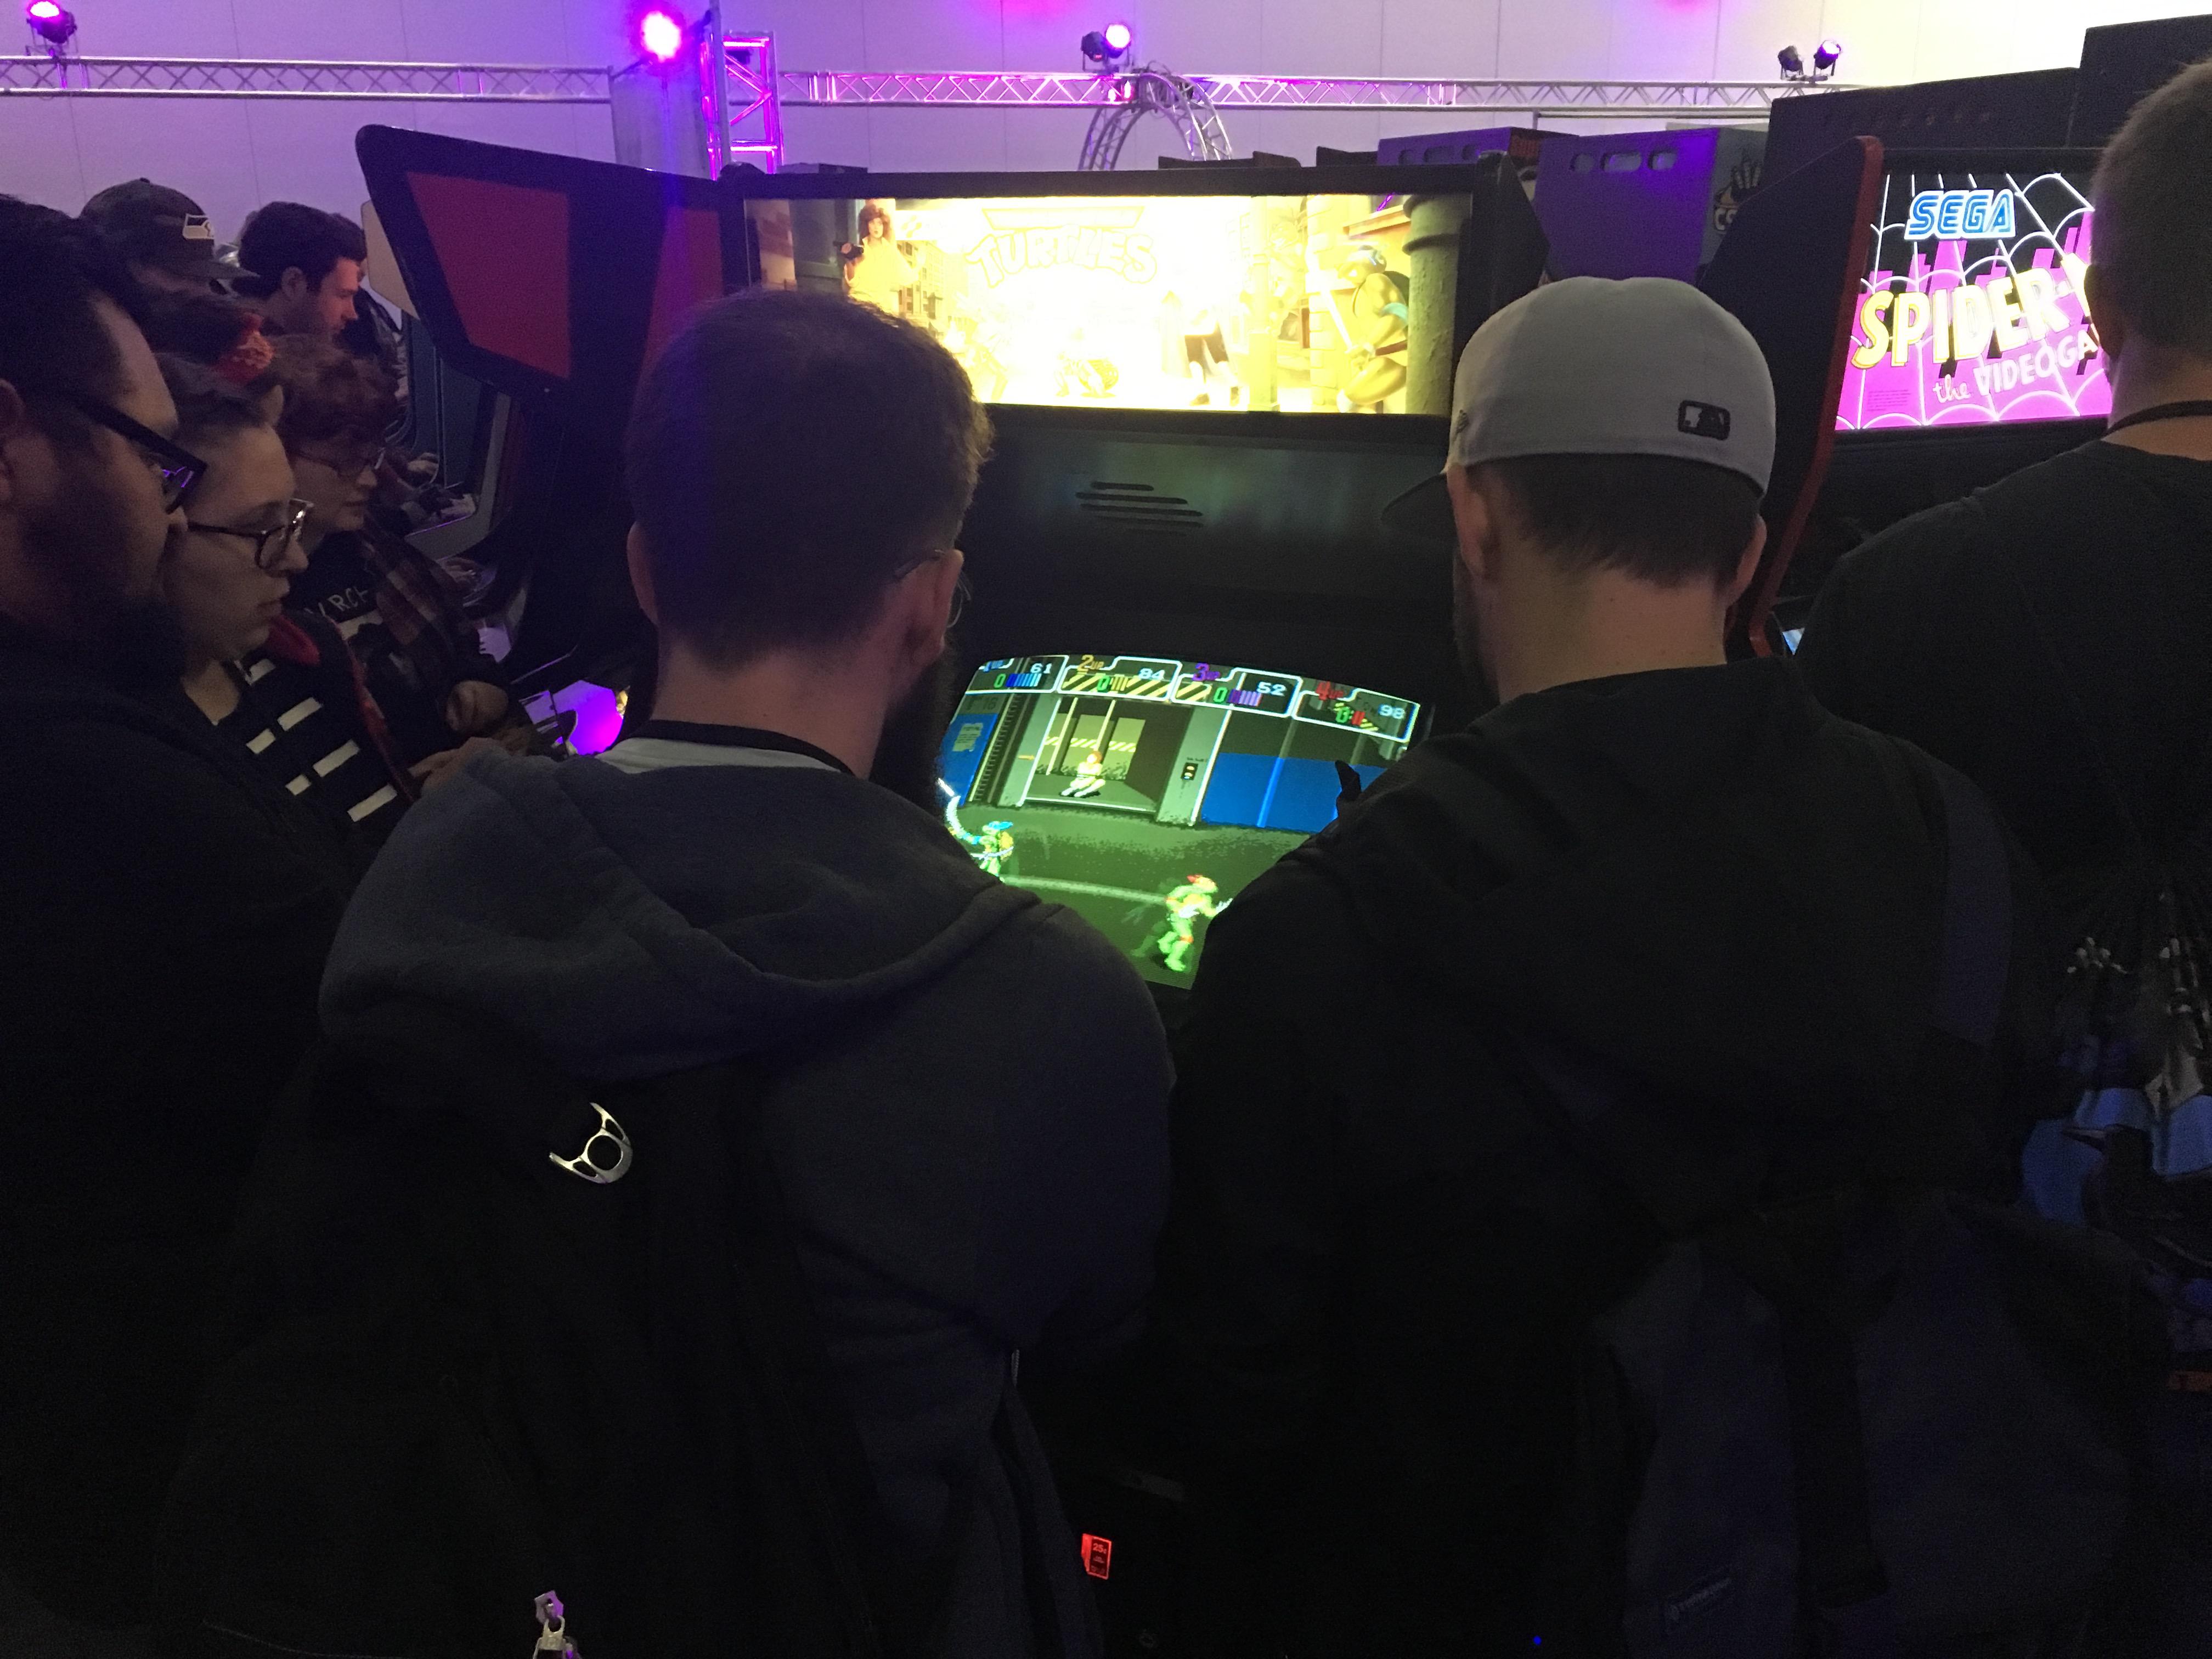 playing-at-the-arcade